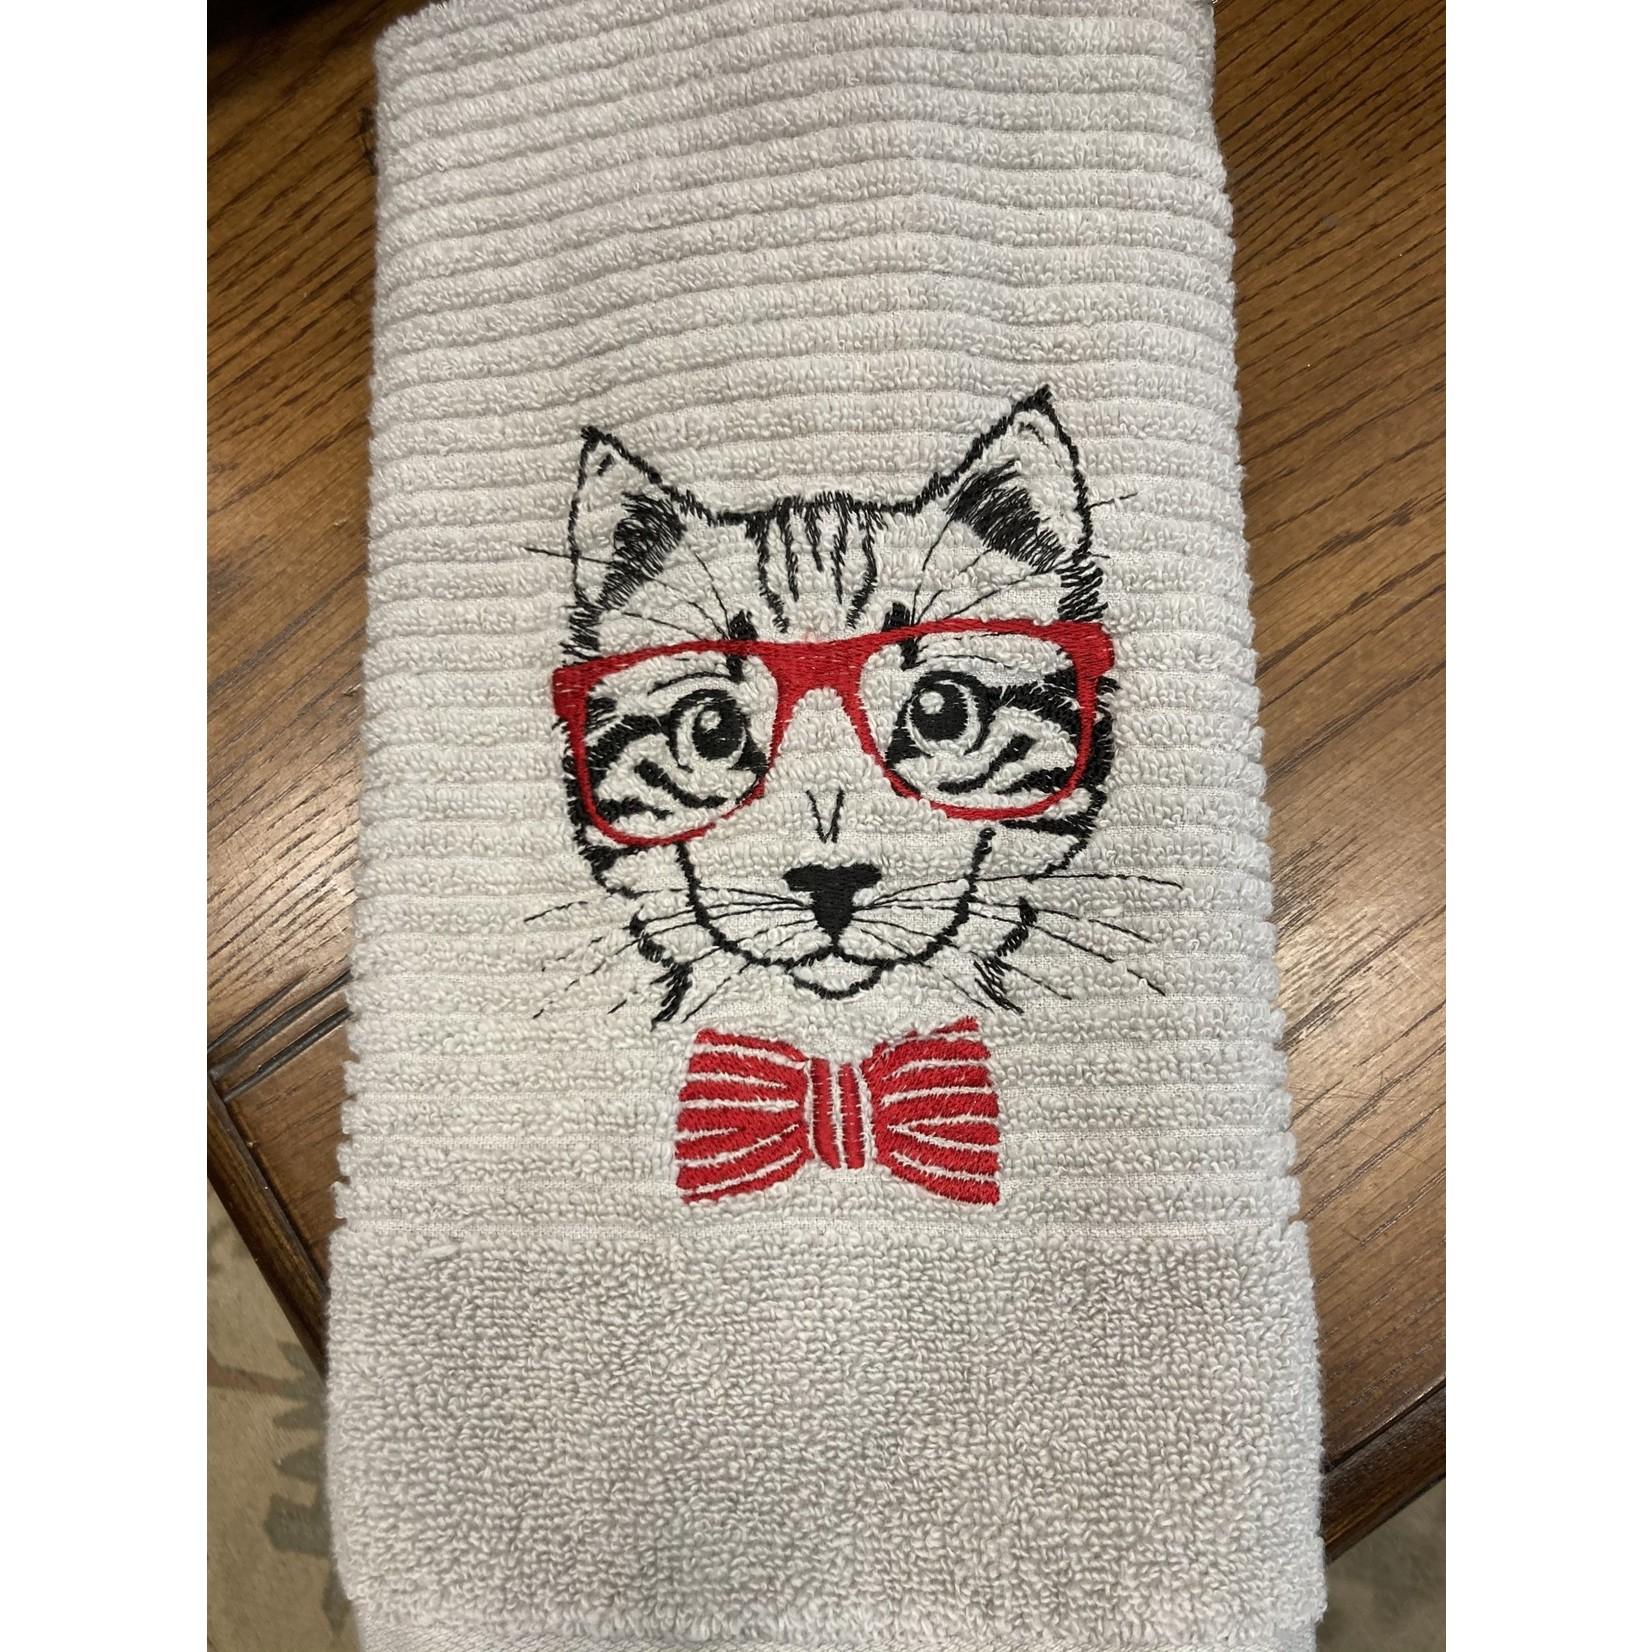 Handmade by Carol Handmade by Carol | Grey handtowel |Red cat with glasses